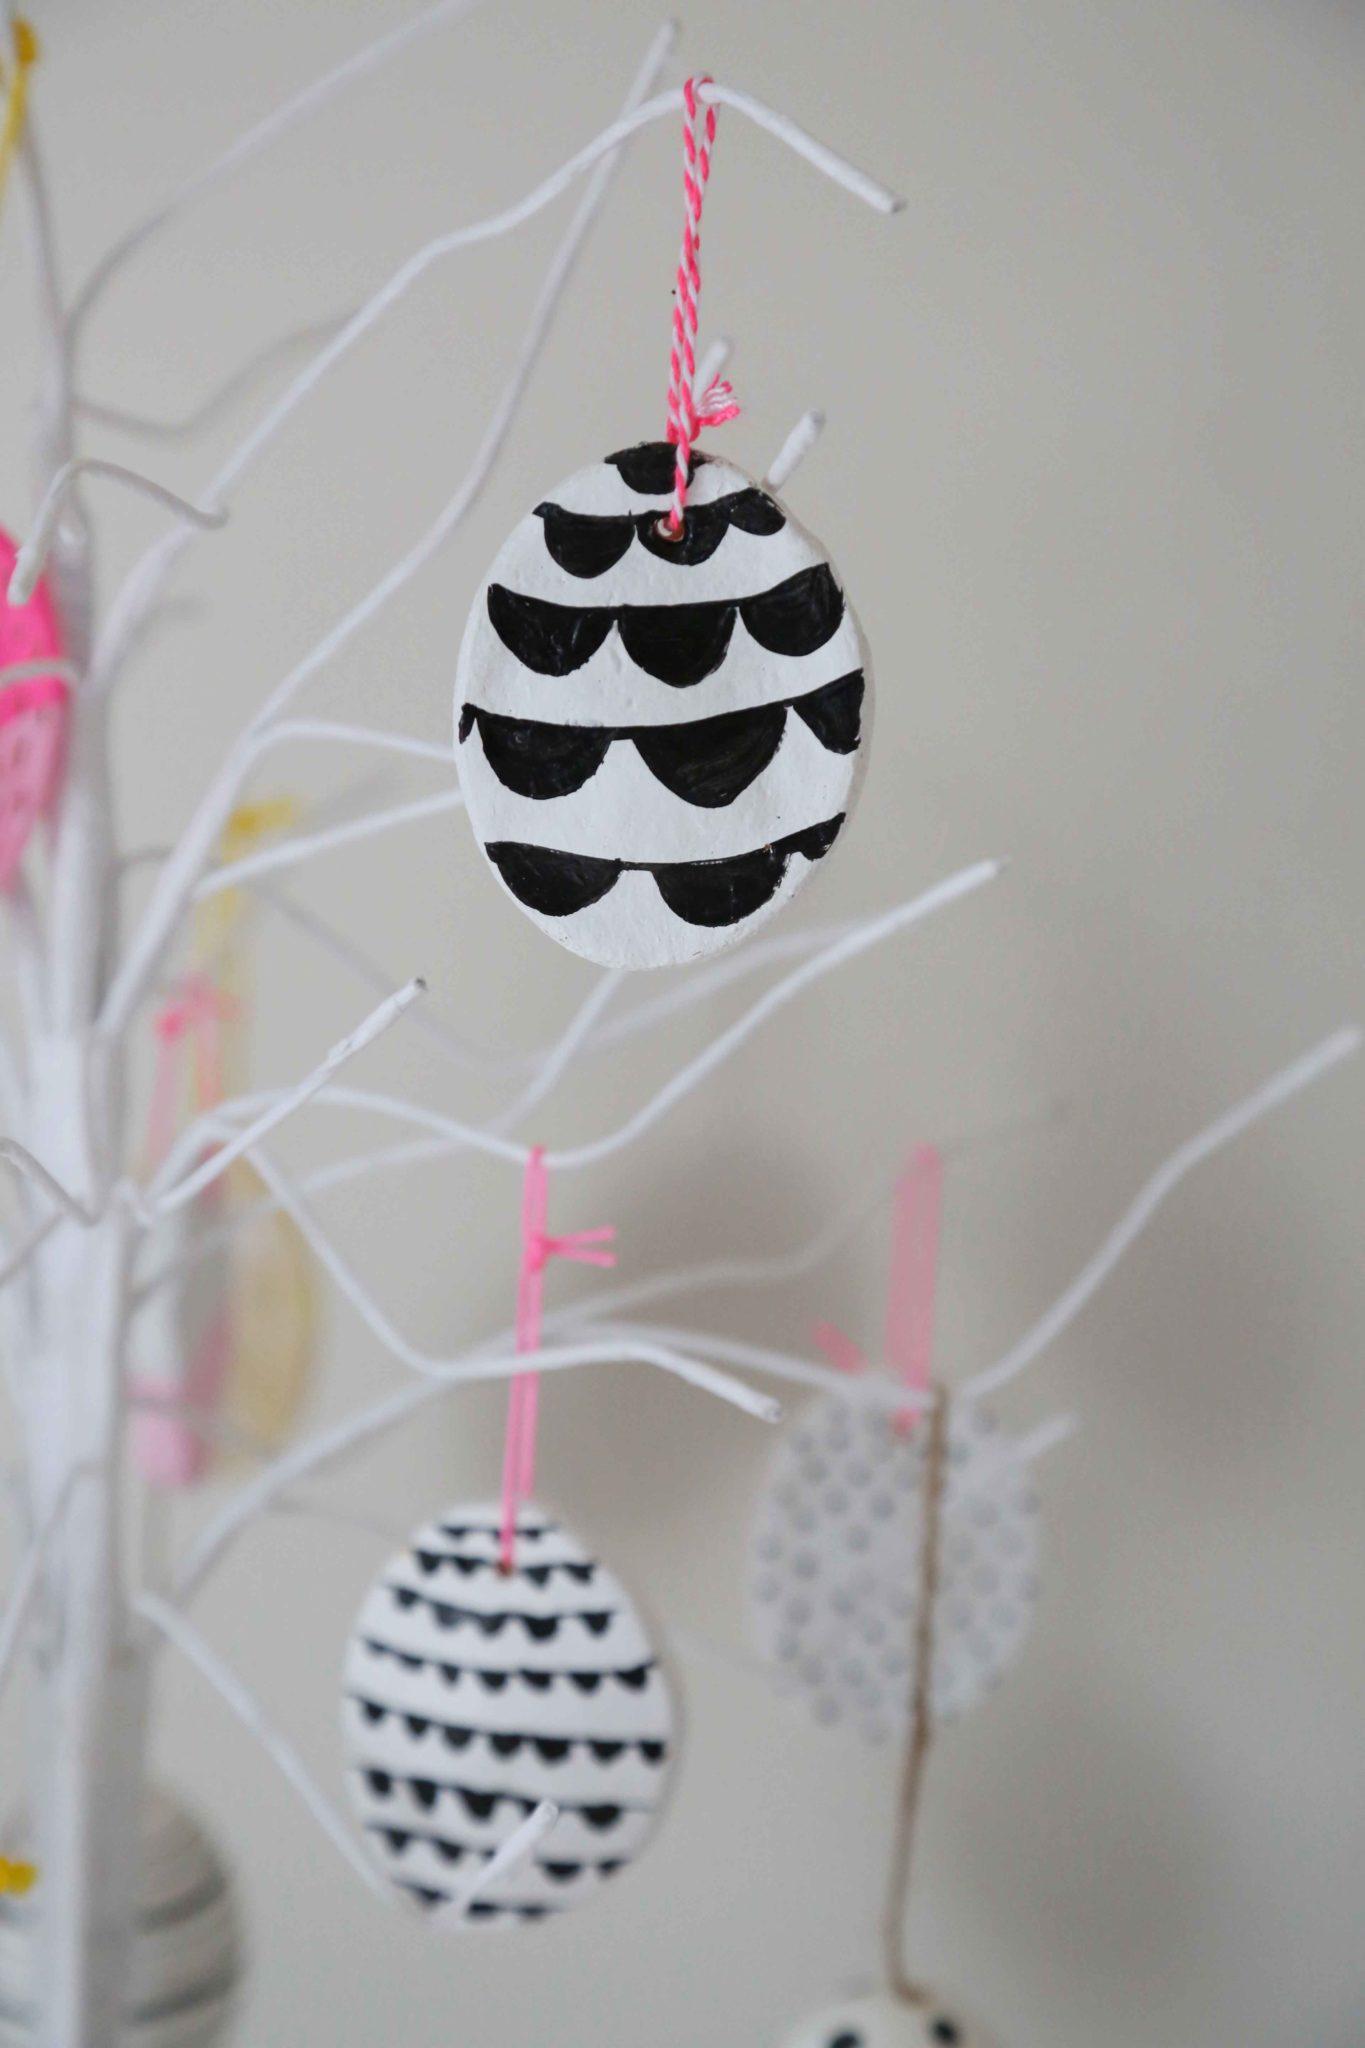 Easter Egg Decoration Kids Craft Clare Keylock